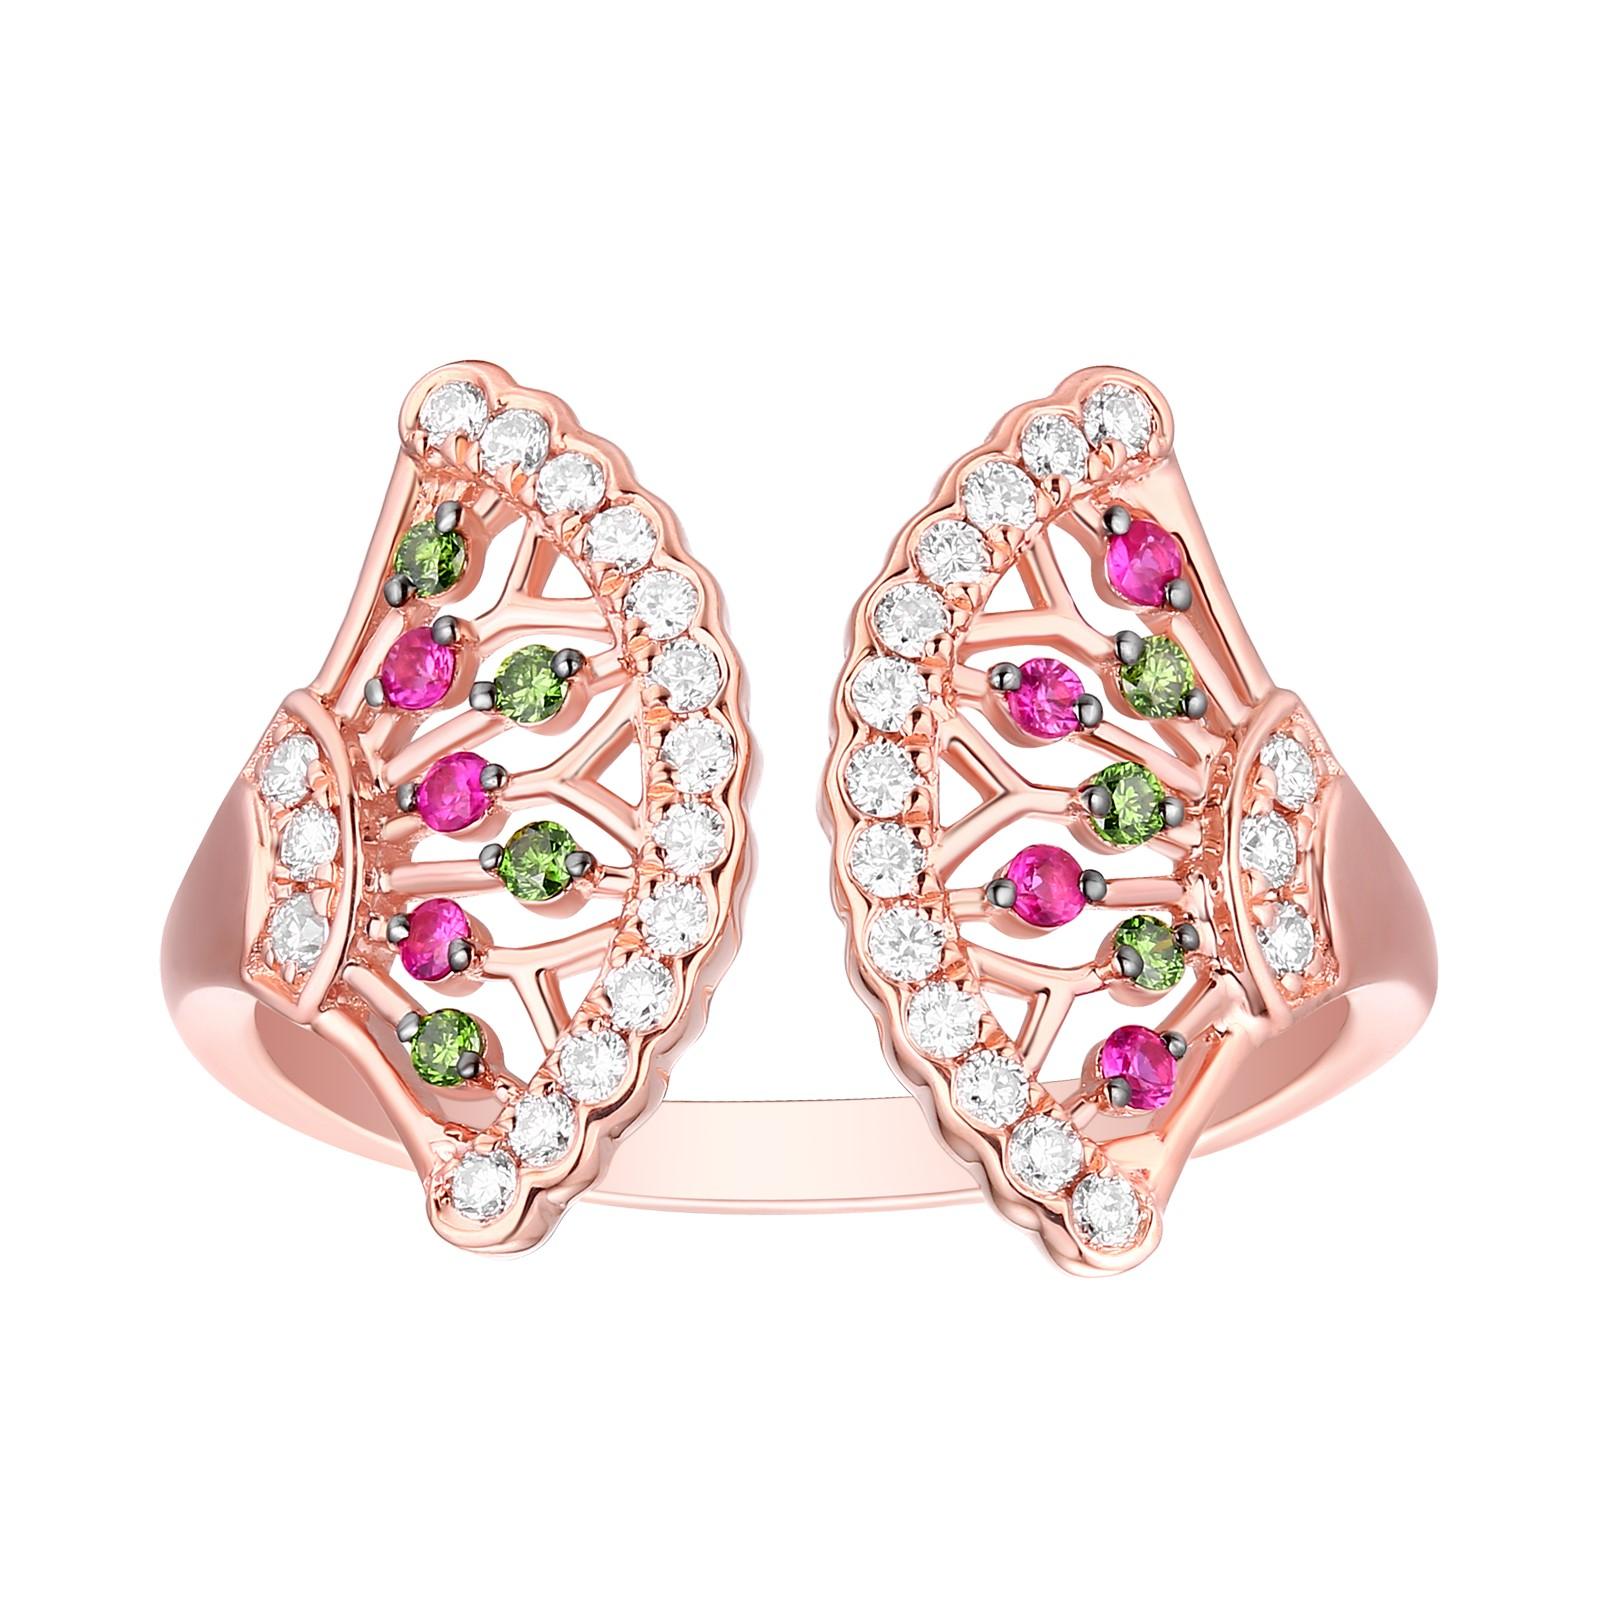 R29901GRW- 14K Rose Gold Diamond Ring, 0.40 TCW